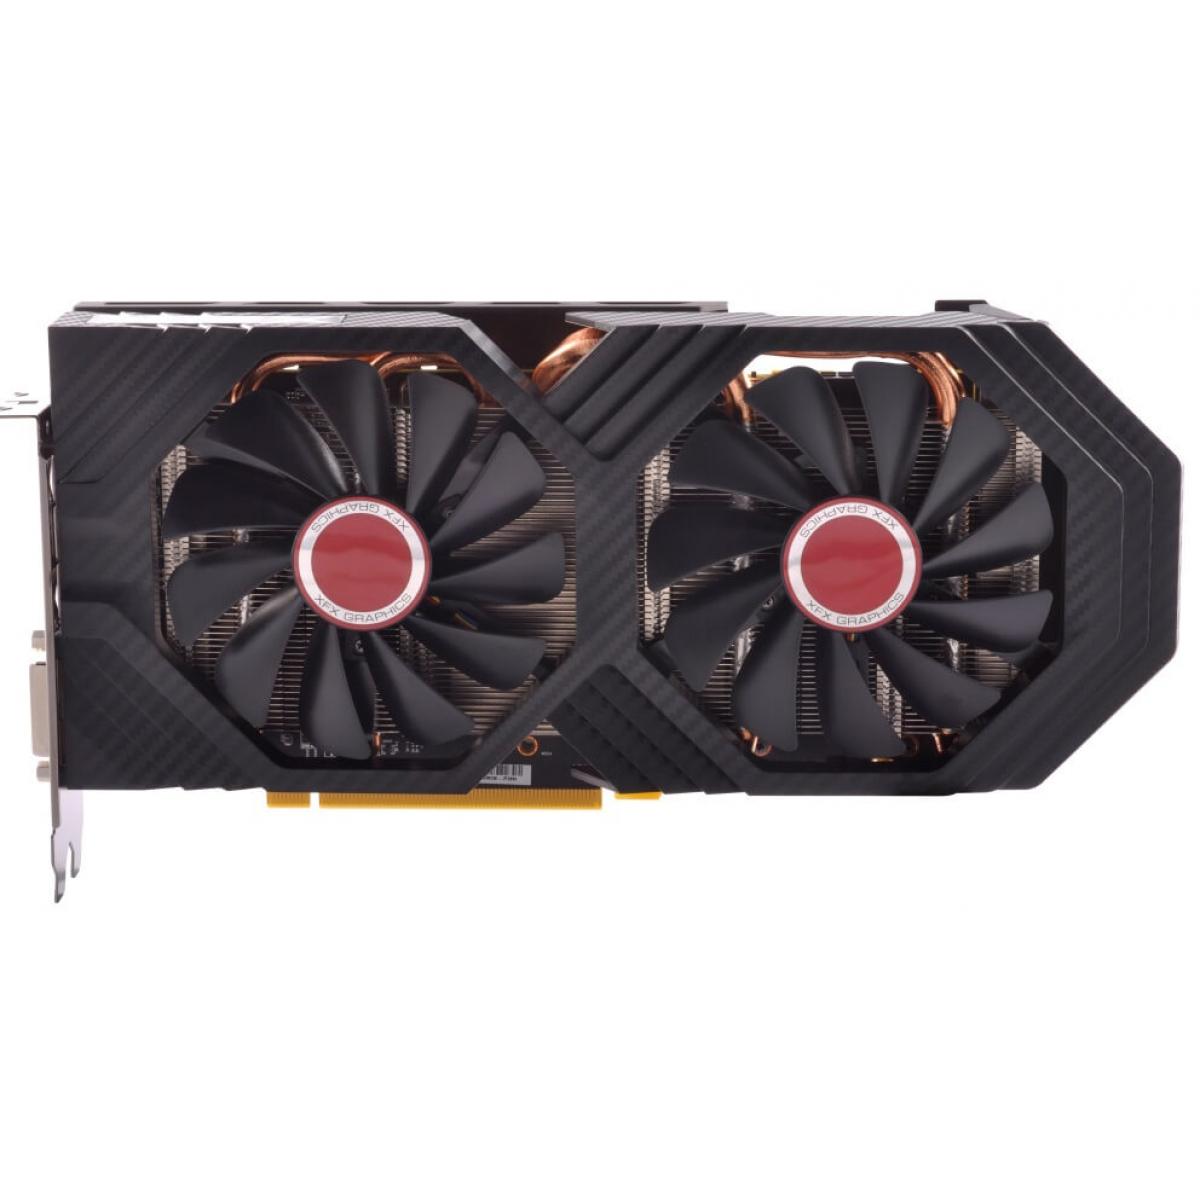 Placa de Vídeo XFX Radeon RX 580 Dual OC+ GTS XXX Edition, 8GB GDDR5, 256Bit, RX-580P8DFD6